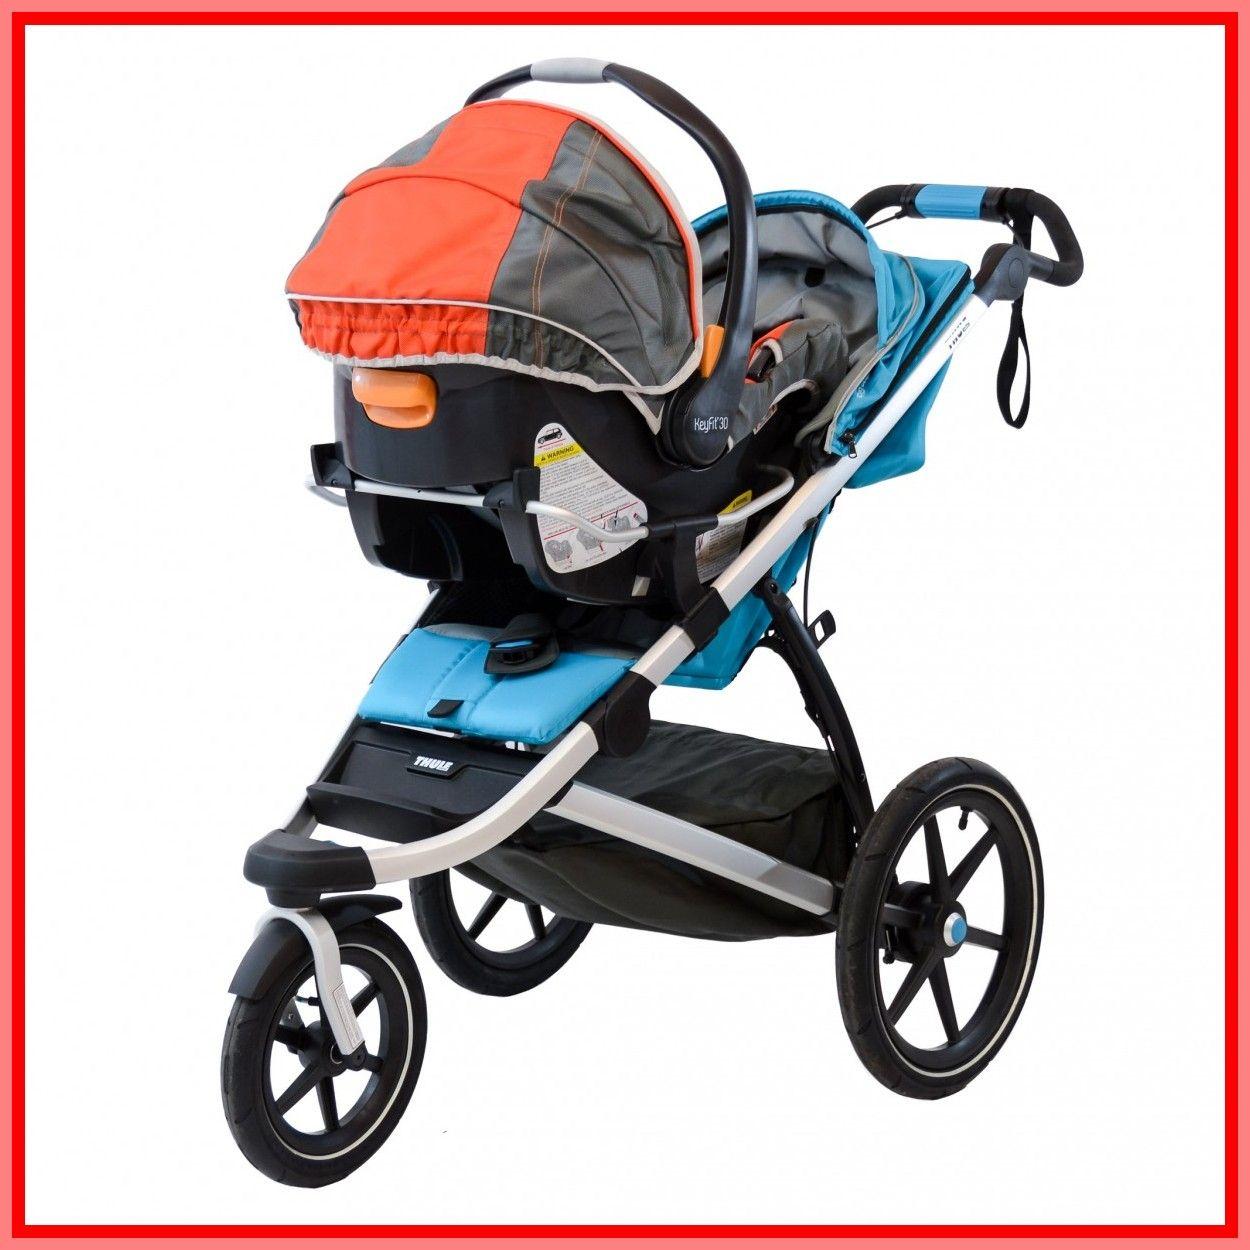 19++ Thule running stroller reviews ideas in 2021